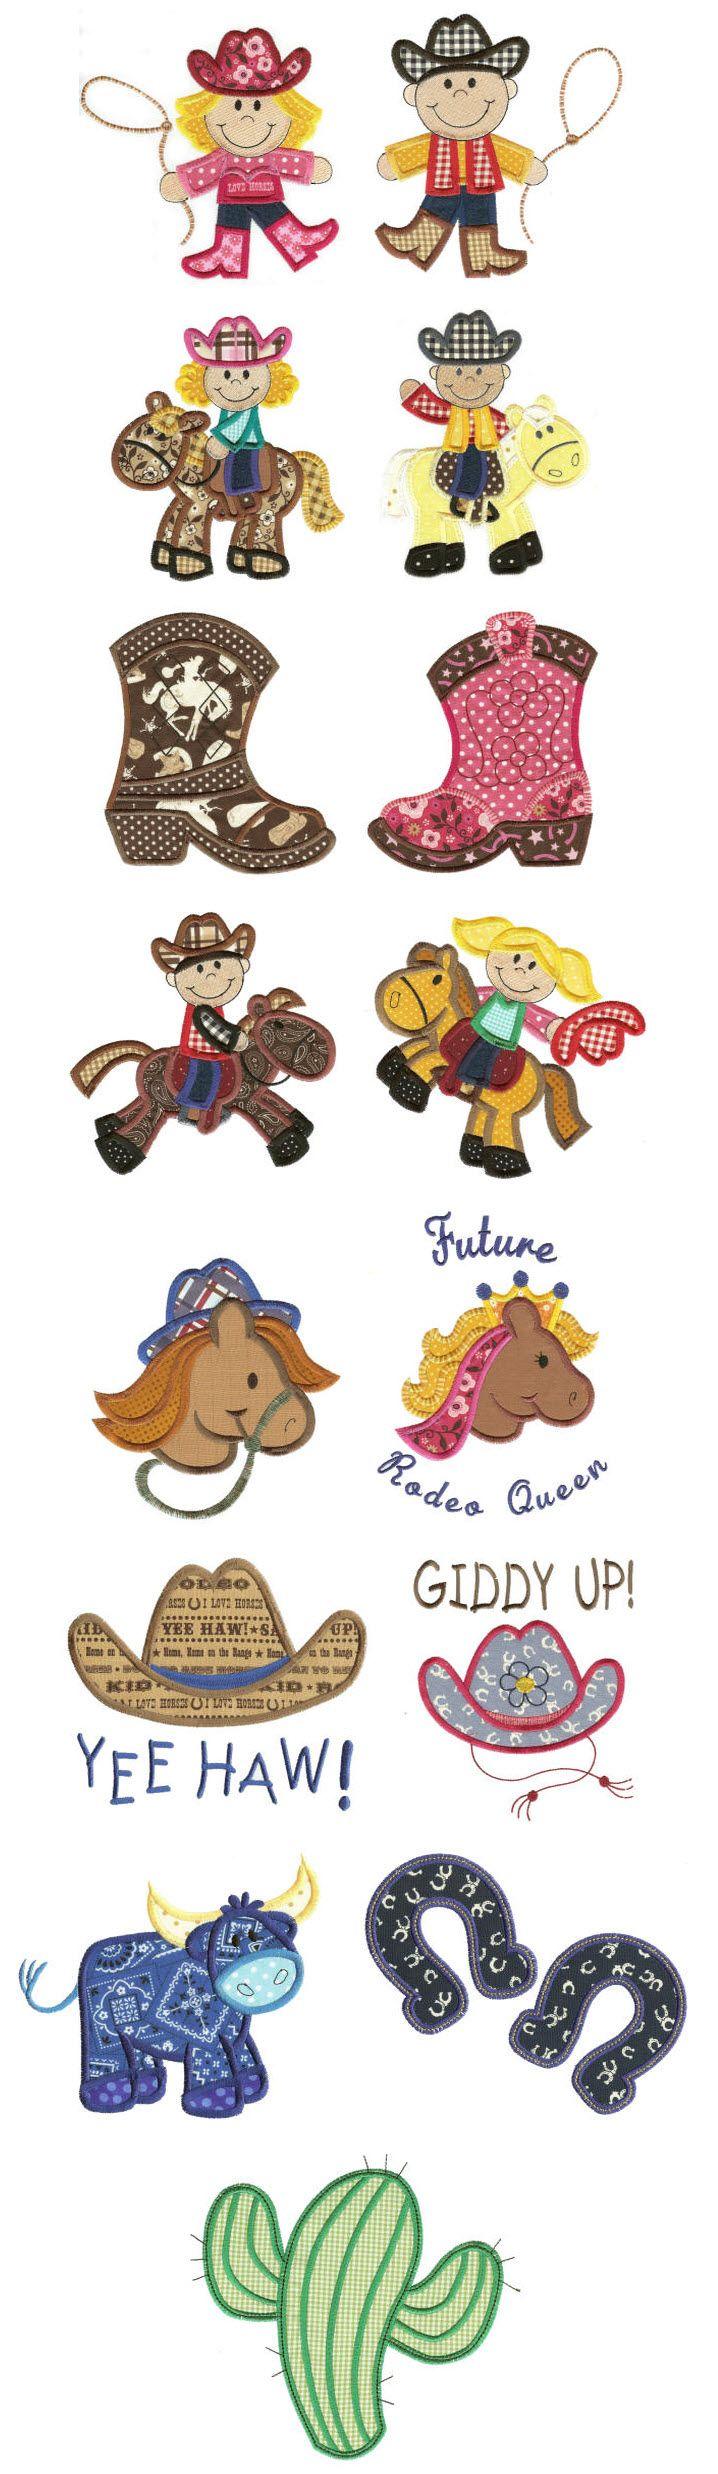 Embroidery | Free Machine Embroidery Designs | Ride Em Cowboy Applique